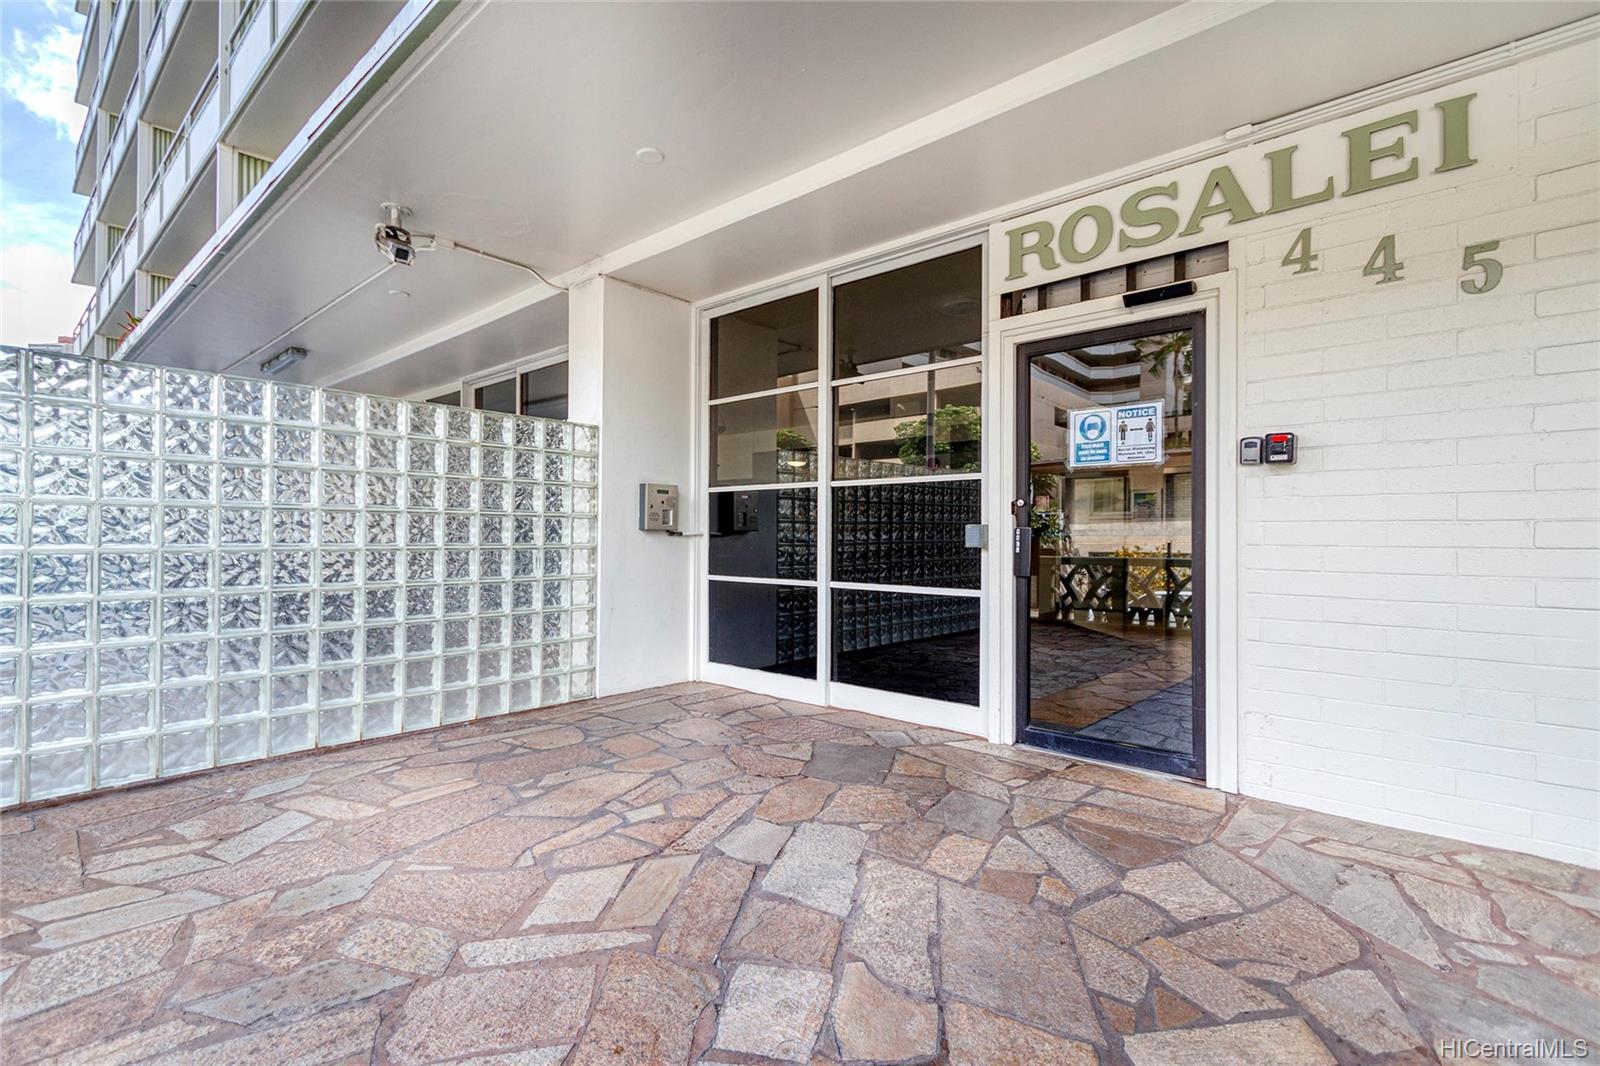 Rosalei Ltd condo # 414, Honolulu, Hawaii - photo 15 of 20